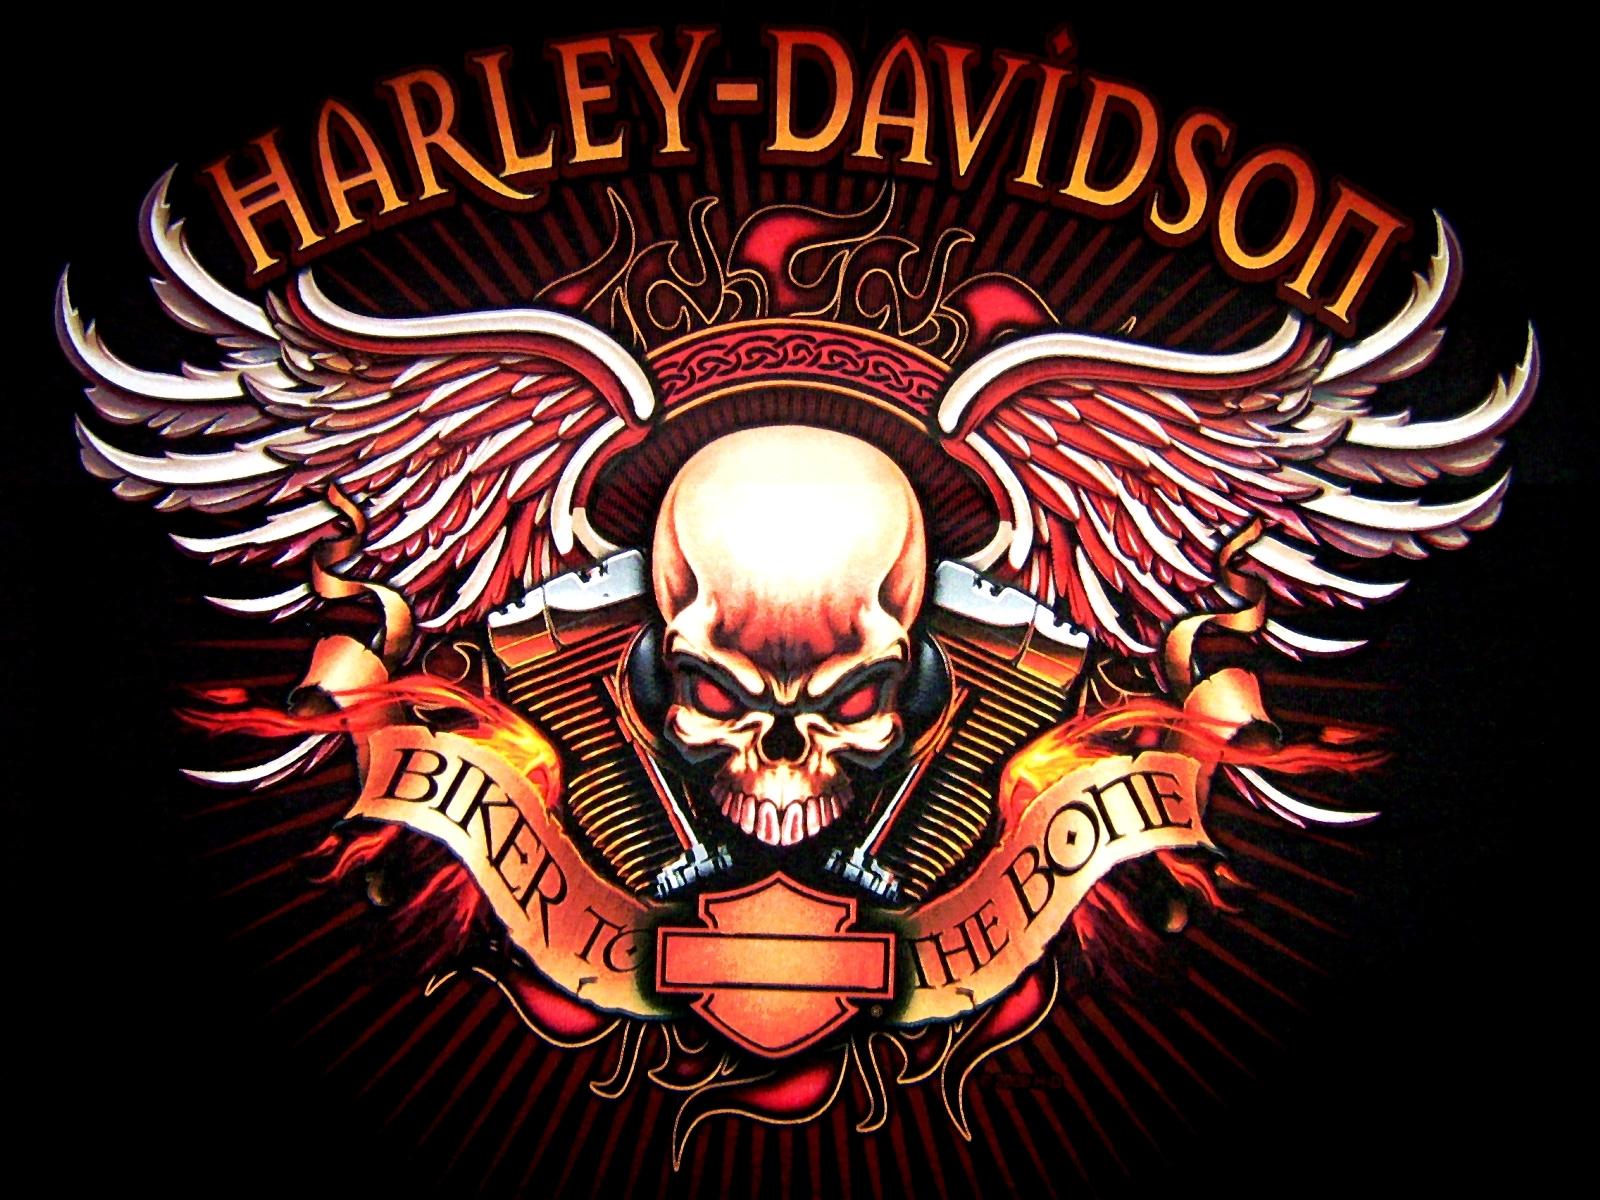 Harley Davidson logo skull bikes motorcycle wallpaper background 1600x1200